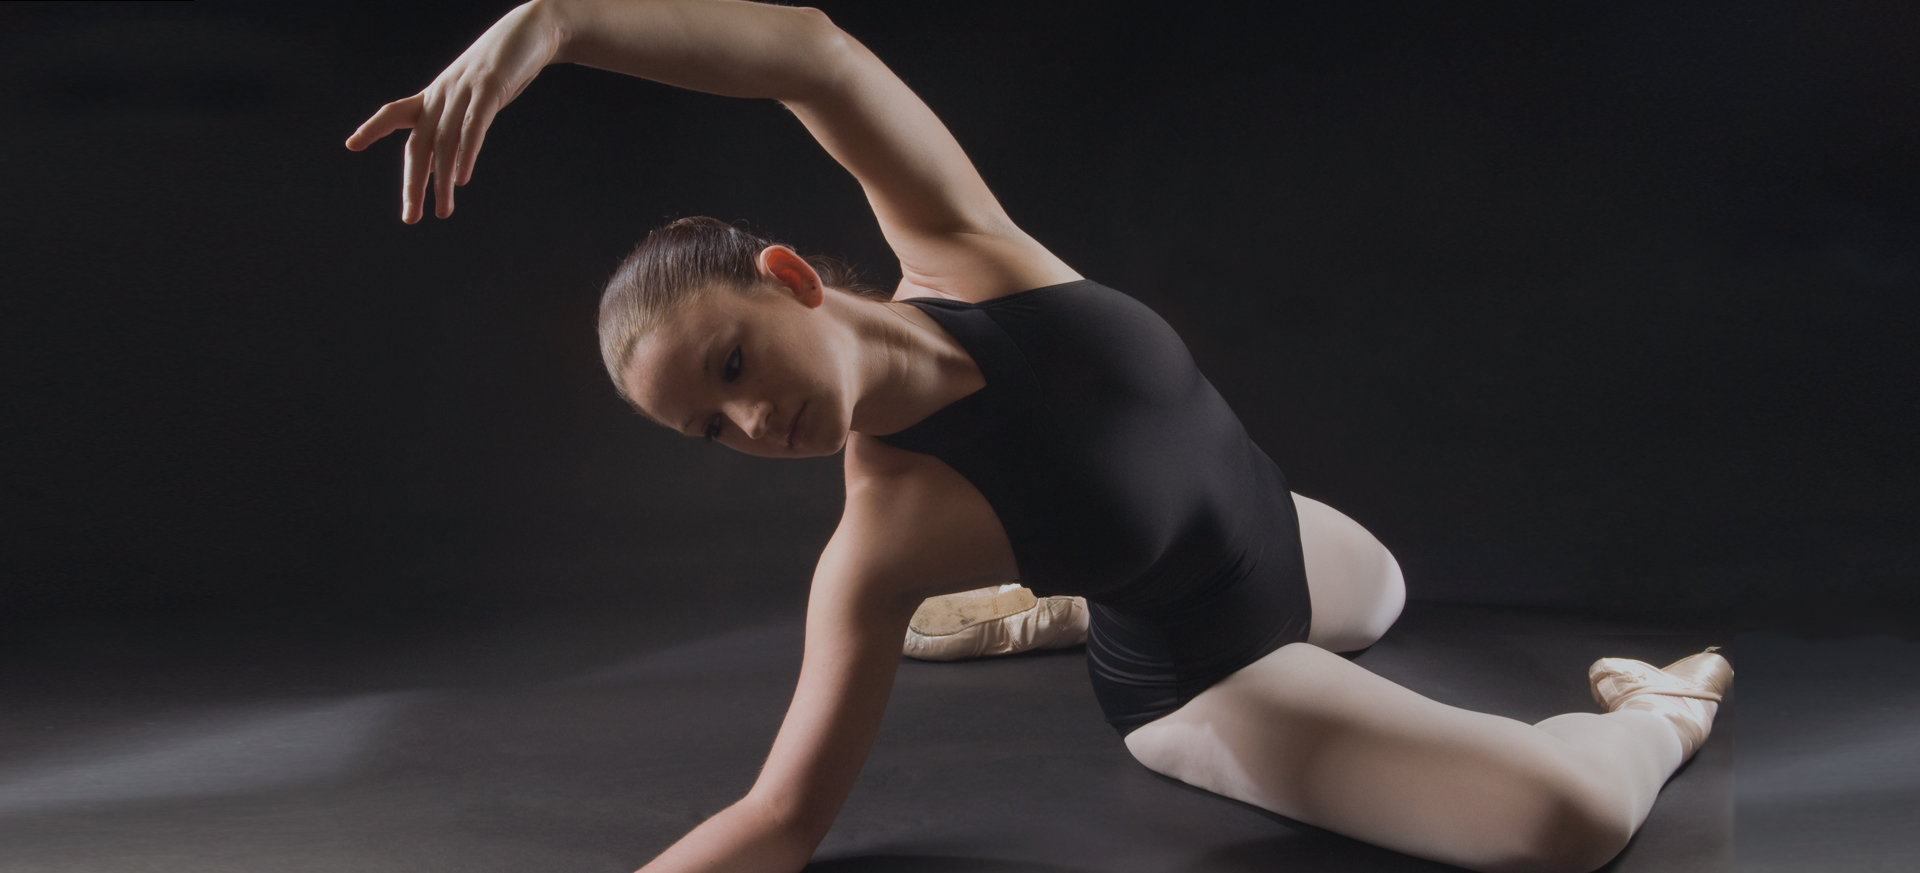 http://nautilusplus.com/content/uploads/2014/01/ballet-body.jpg